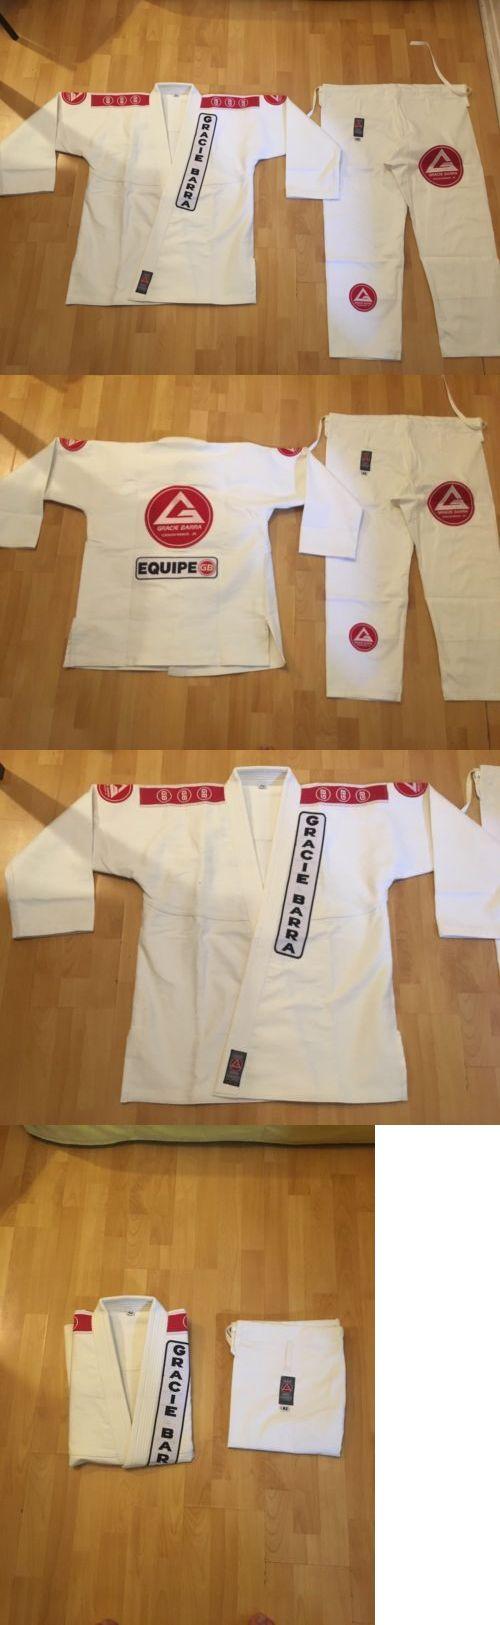 Uniforms and Gis 179774: Gracie Barra Mens Gi A2 Brand New Jiu Jitsu Bjj Syr Ctrl Keiko Atama Mma Ufc -> BUY IT NOW ONLY: $130 on eBay!